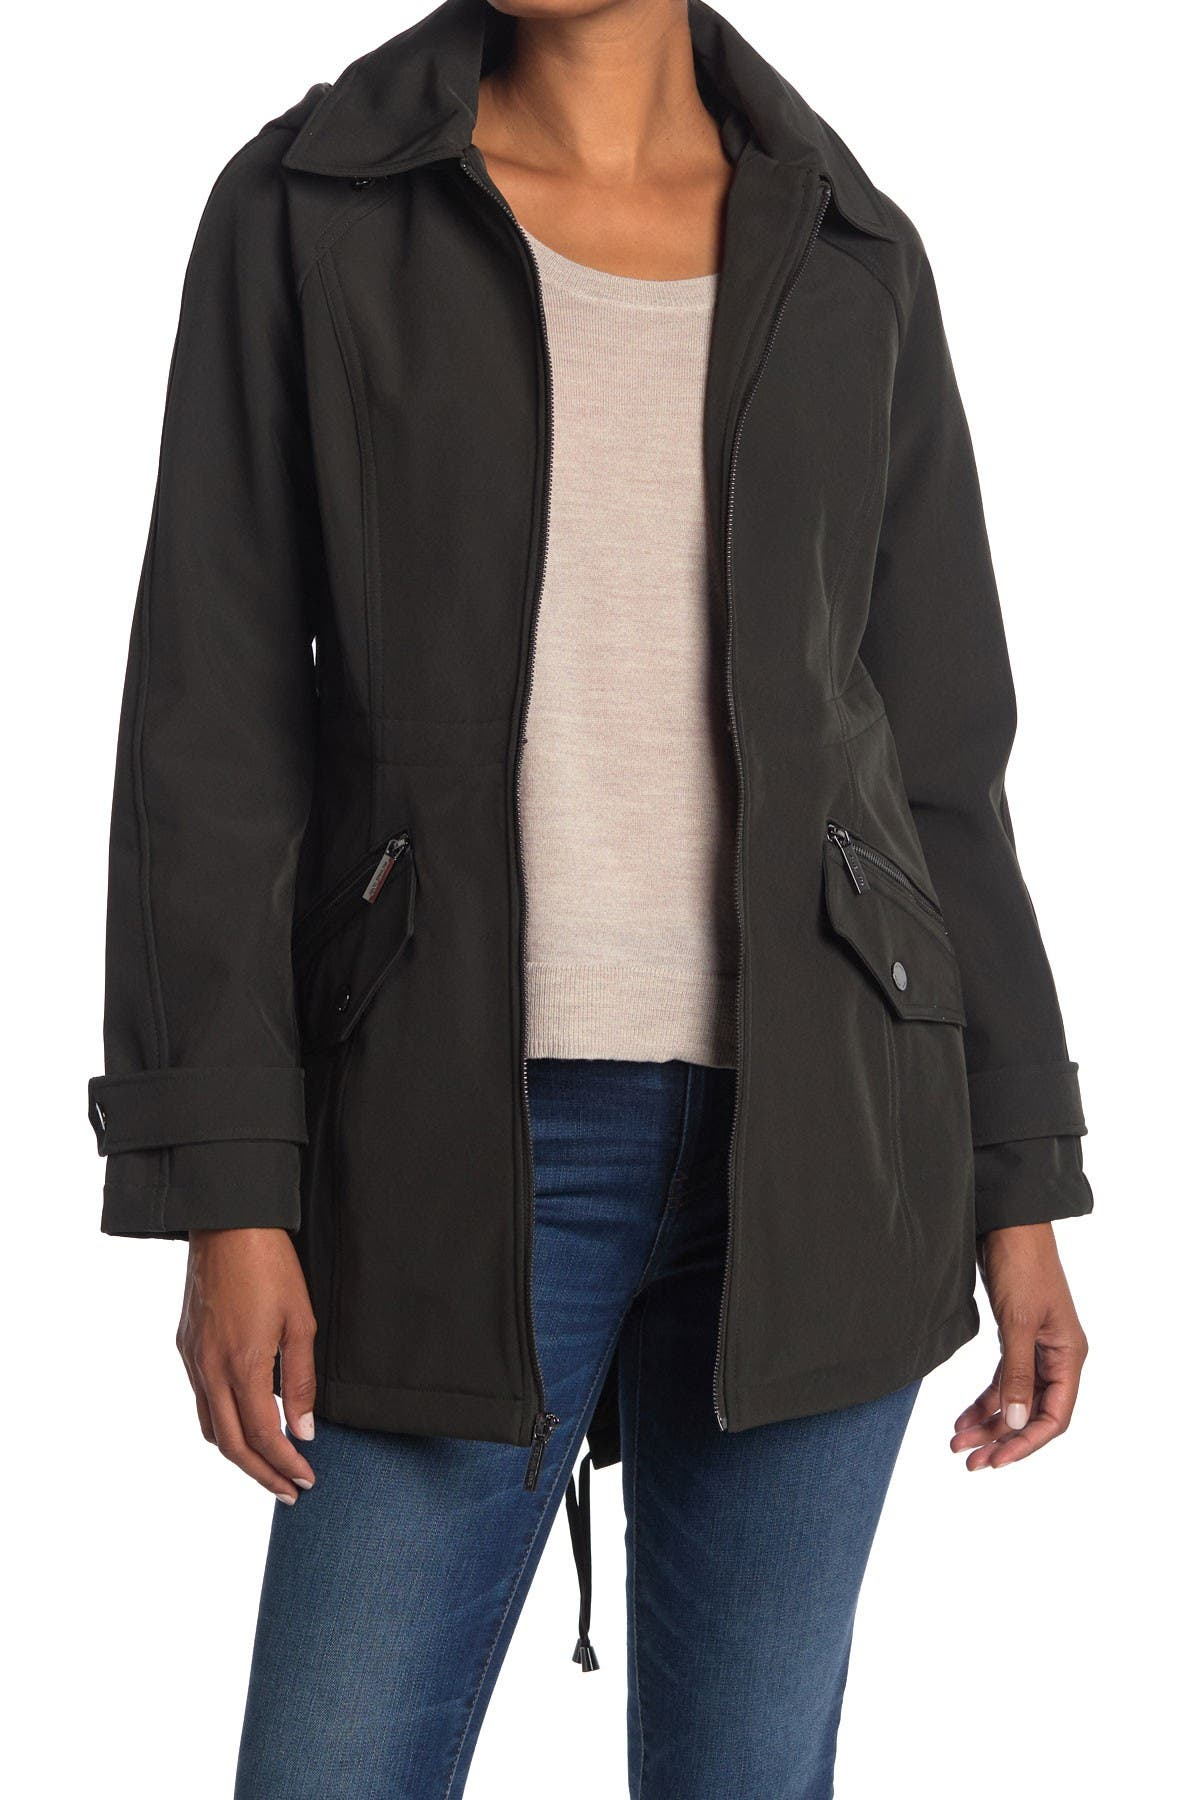 Image of Michael Kors Soft Shell Jacket